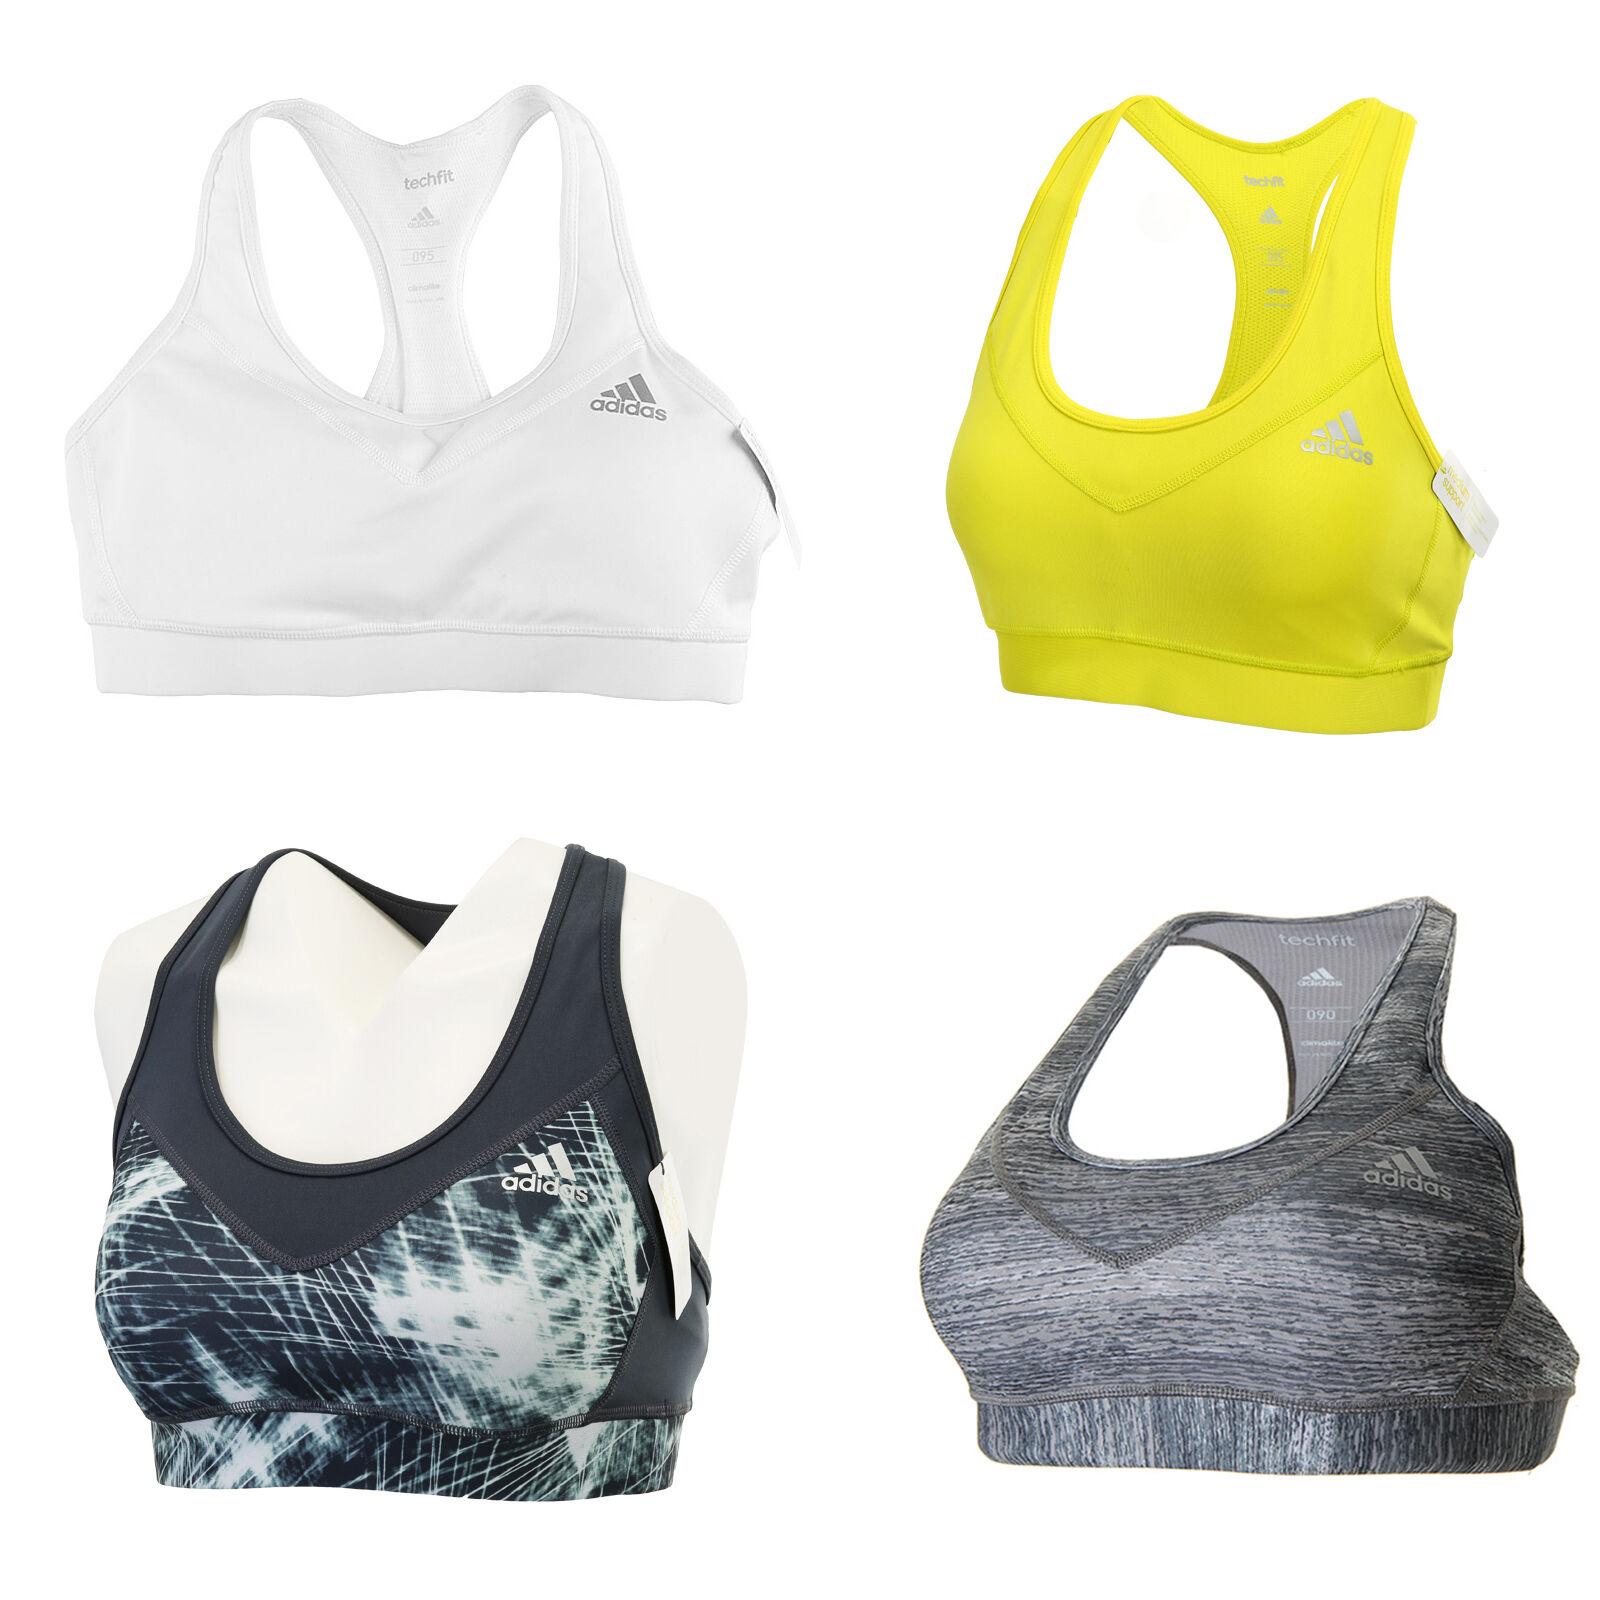 Adidas Women's Techfit Bra AP0216 AY3144 AY3175 BK3800 Yoga Training  Climalite  hot limited edition